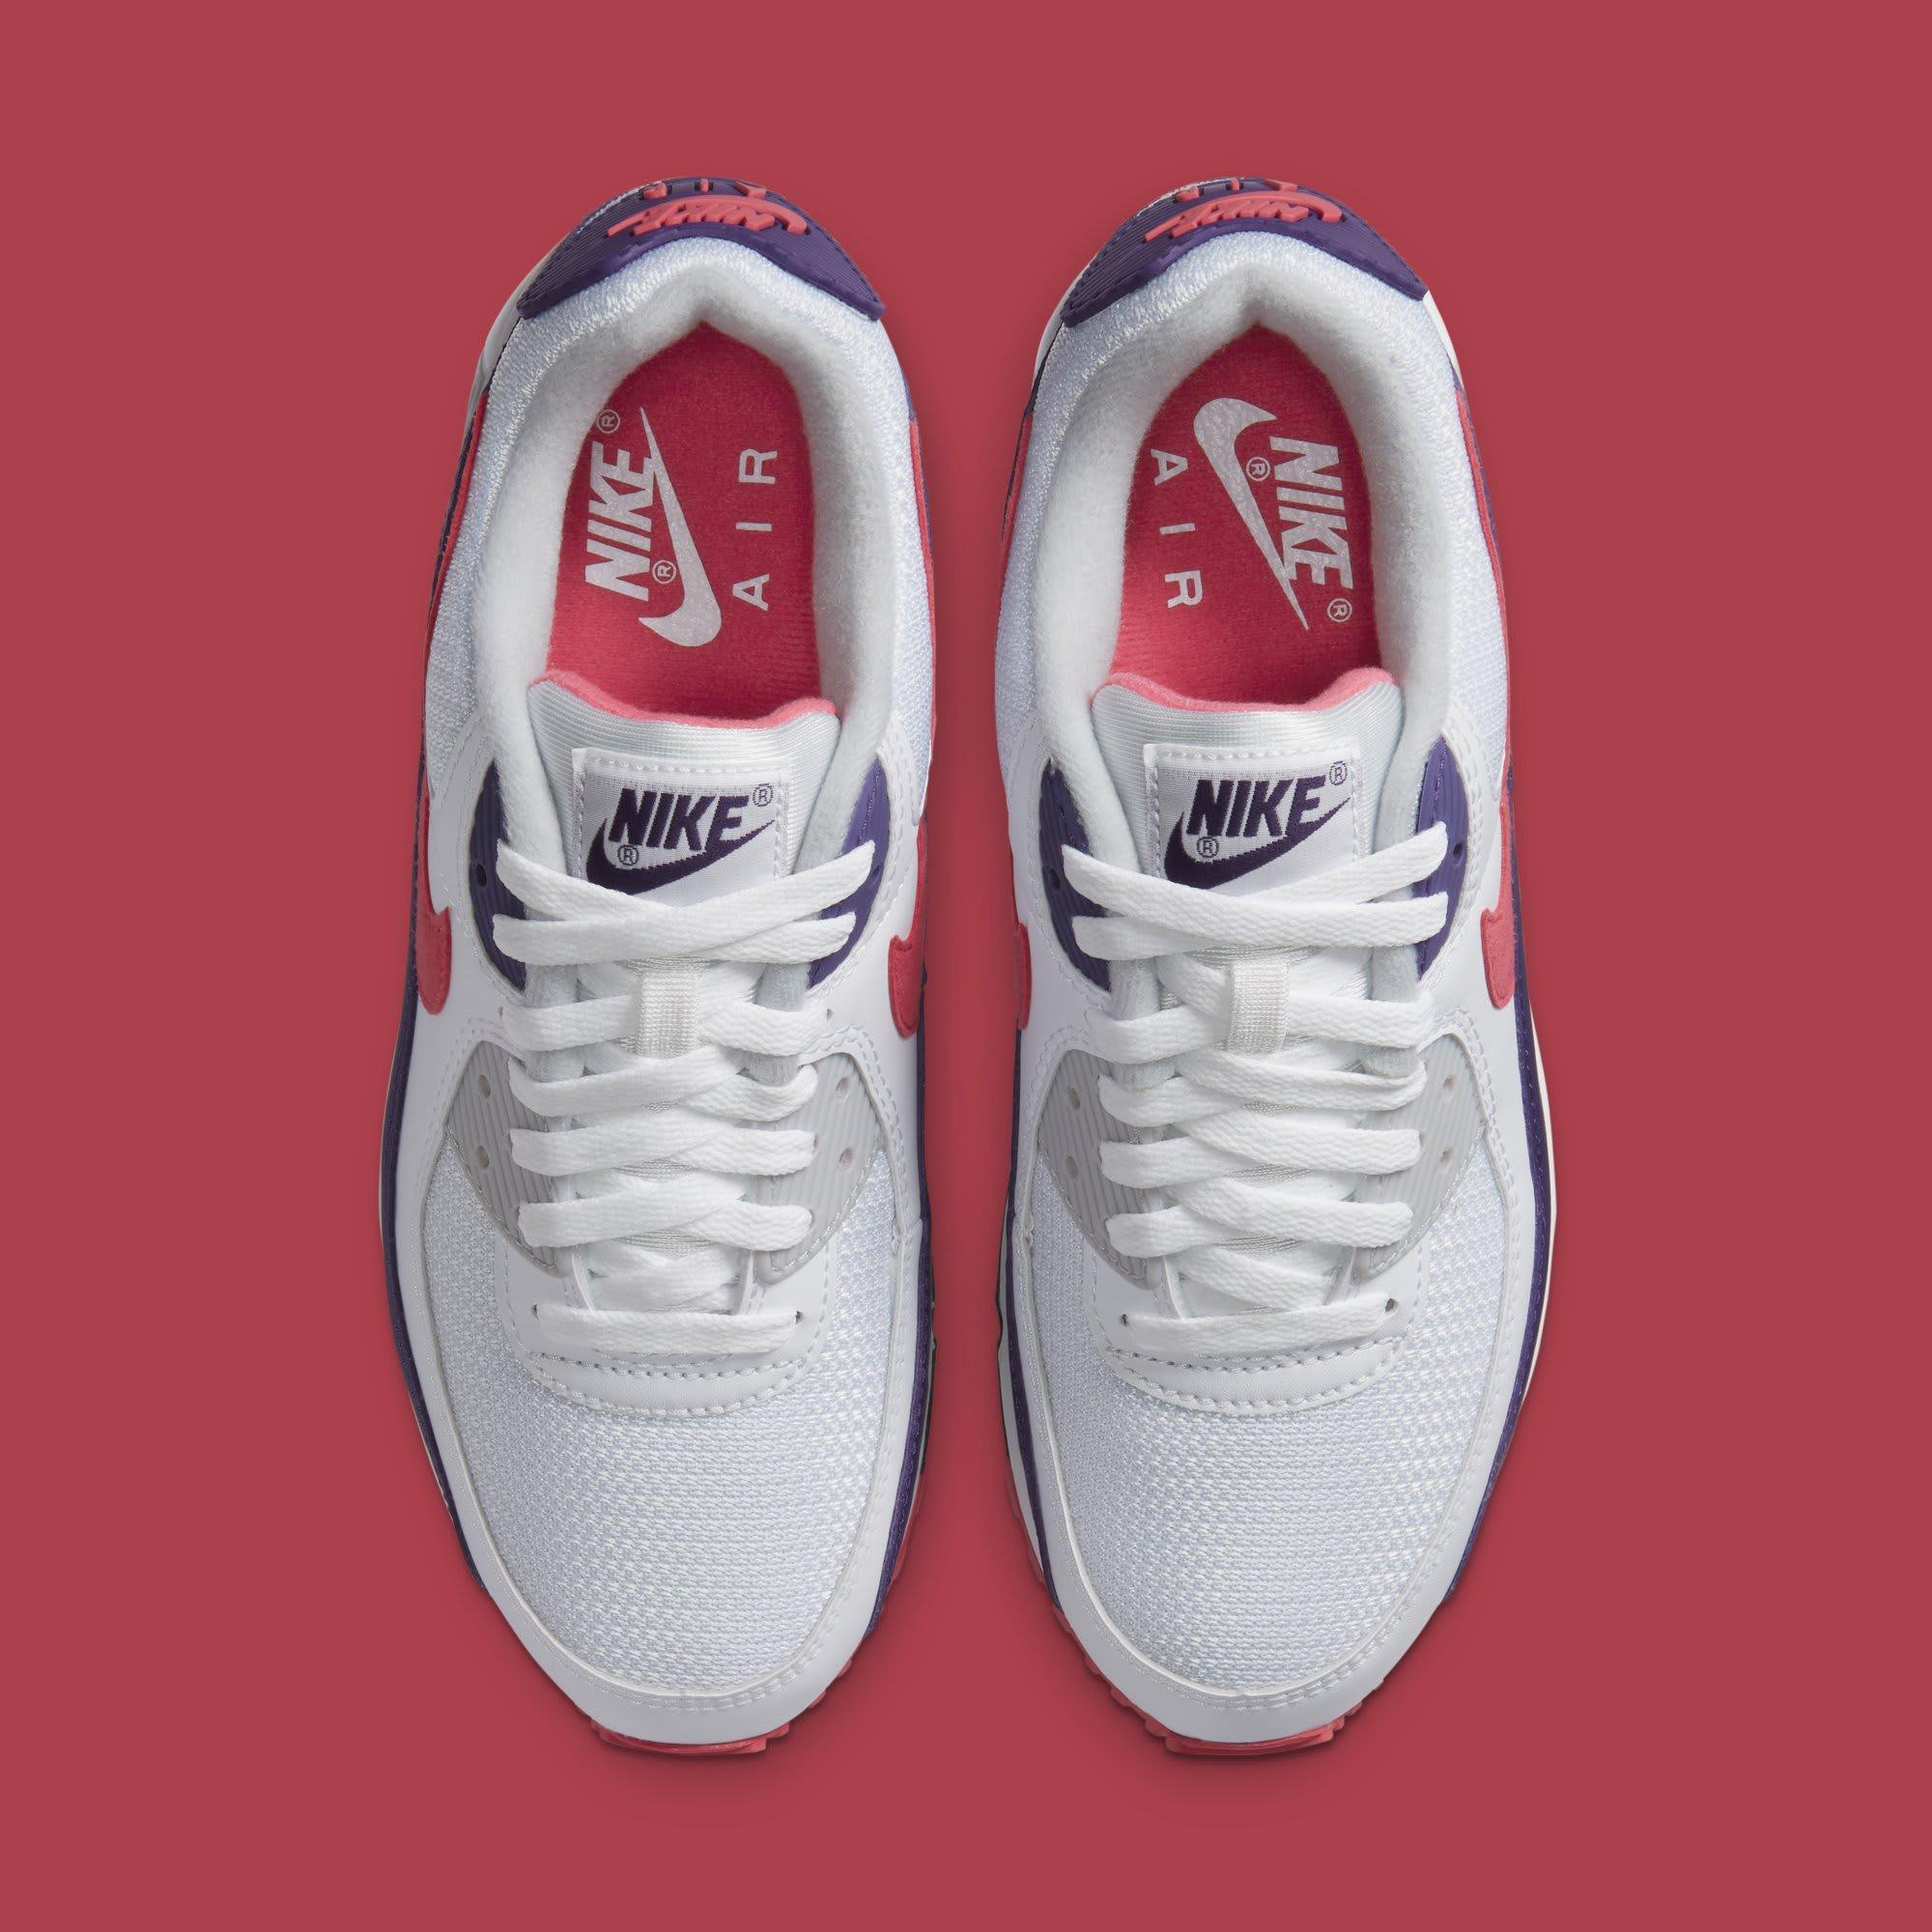 Nike Air Max 90 Women's 'Eggplant' CW1360-100 Top